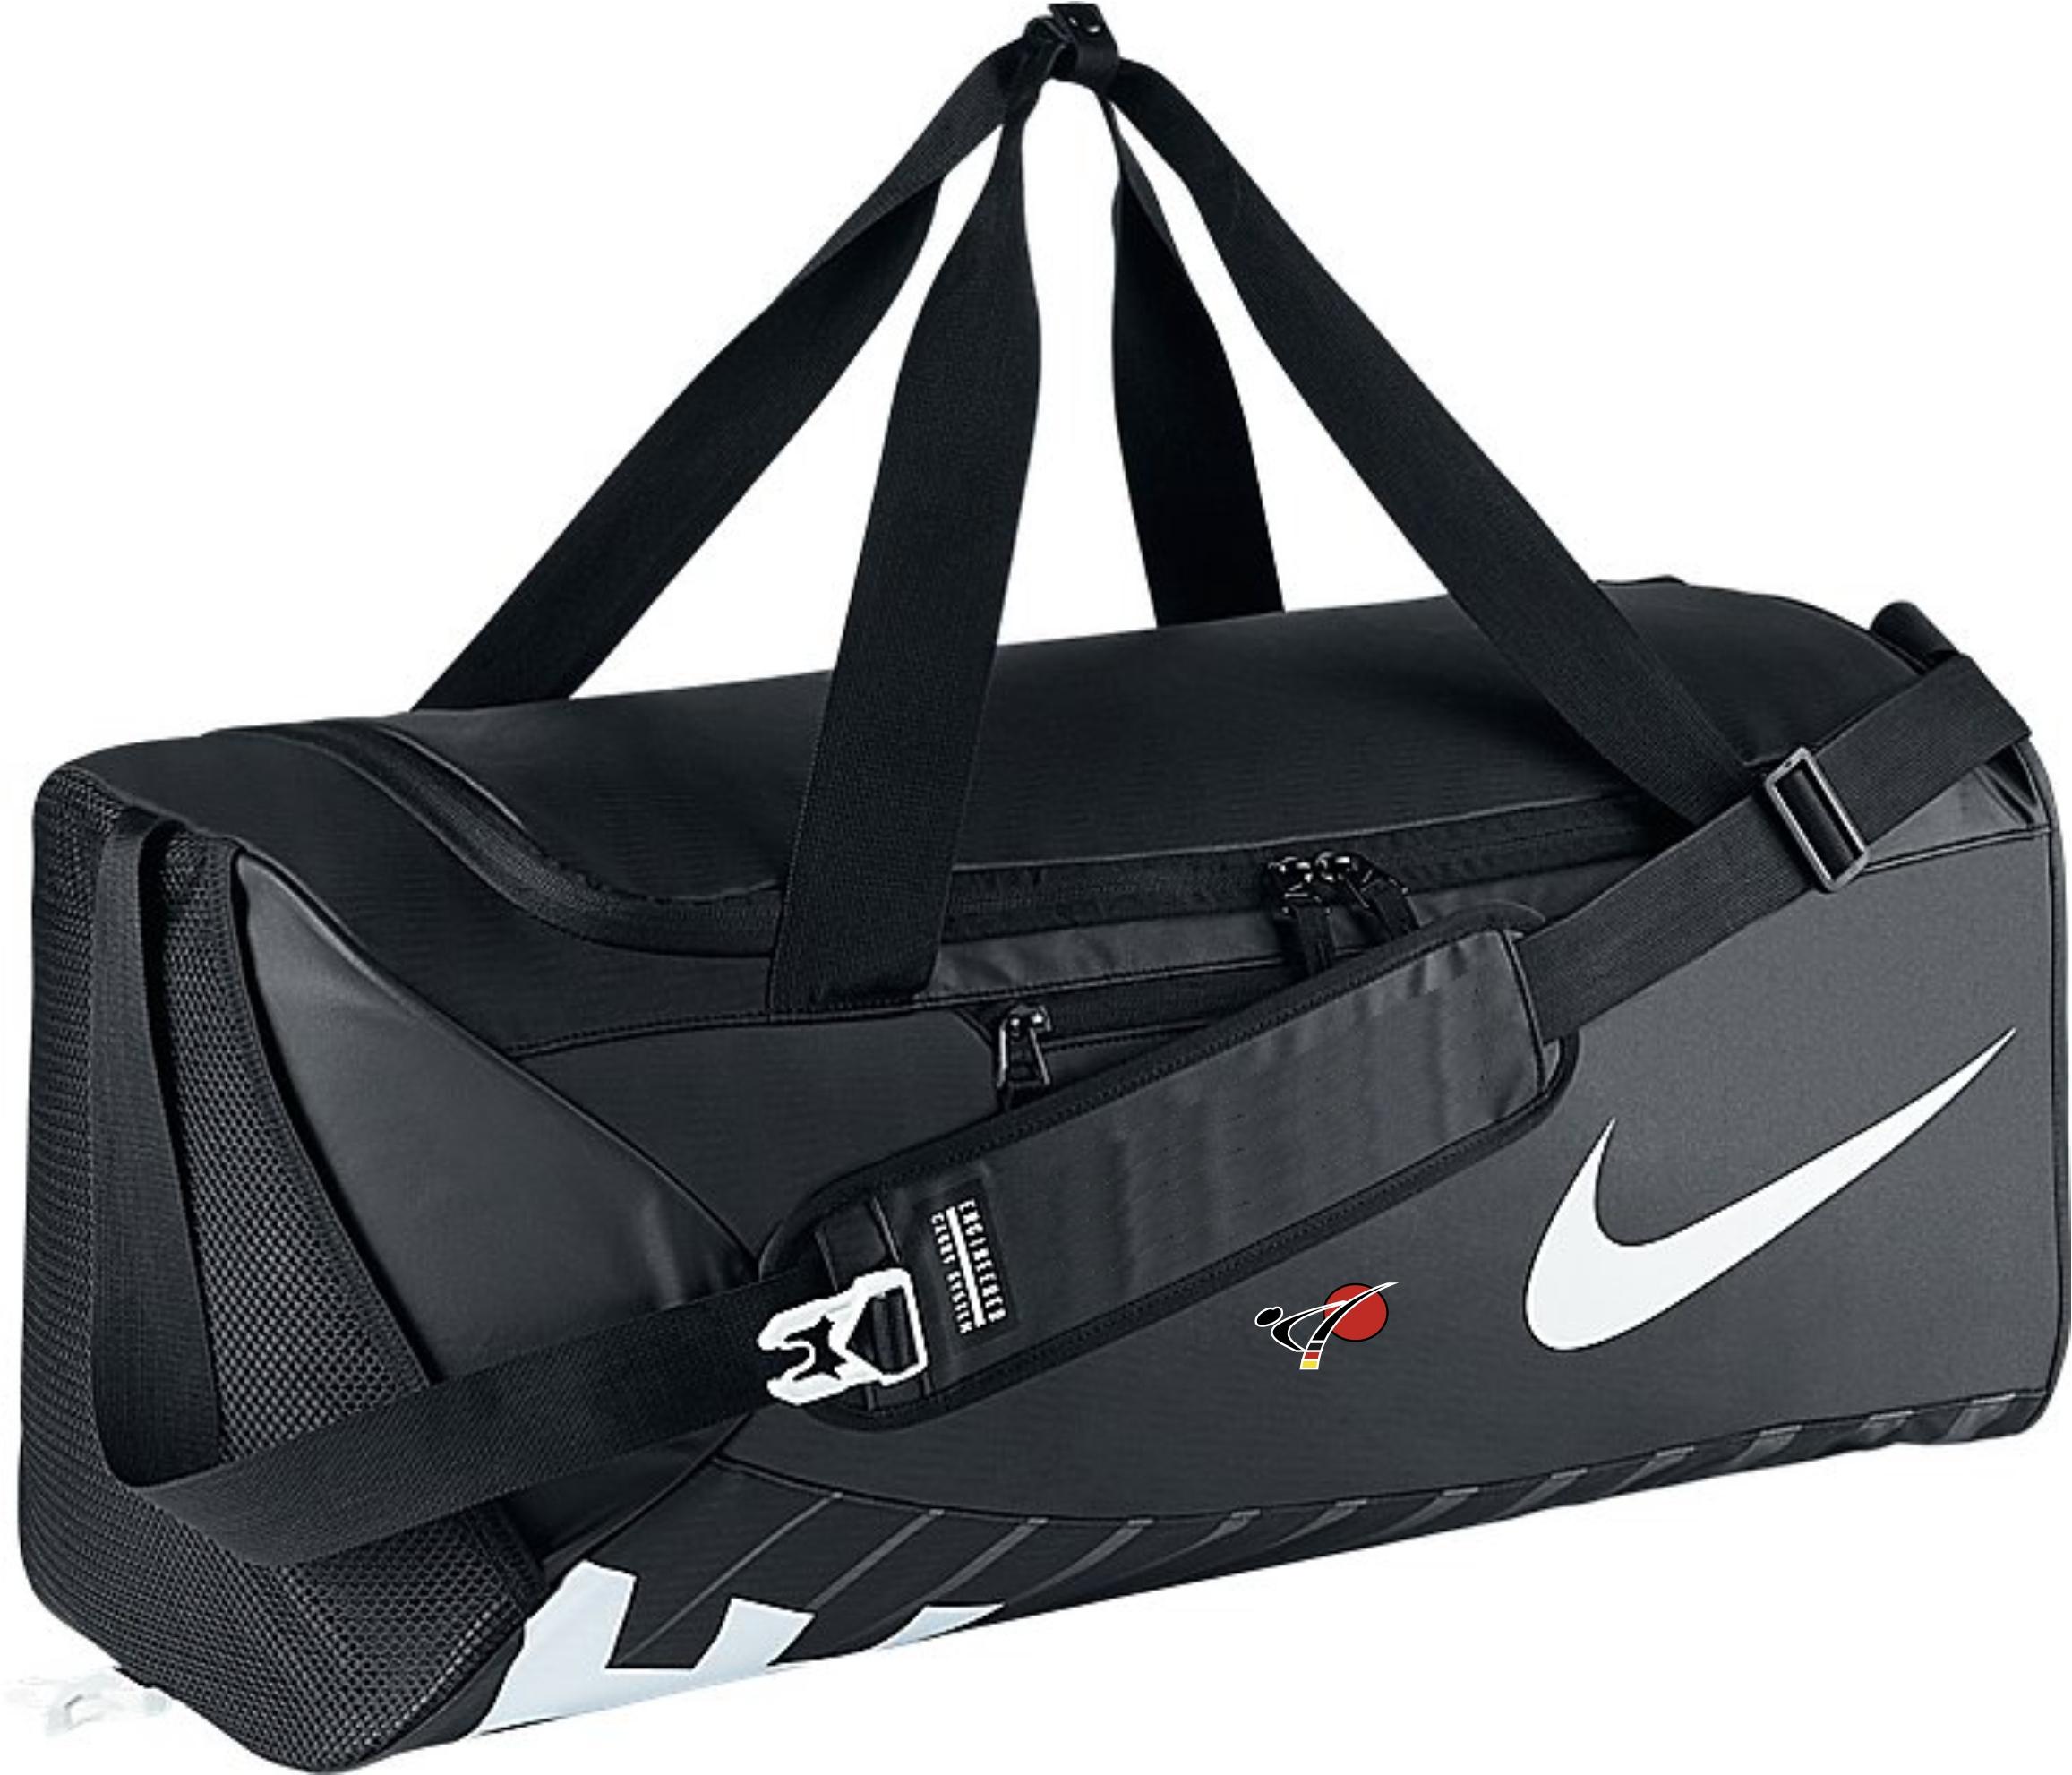 nike sporttasche mit dkv logo ausr stung f r karate. Black Bedroom Furniture Sets. Home Design Ideas